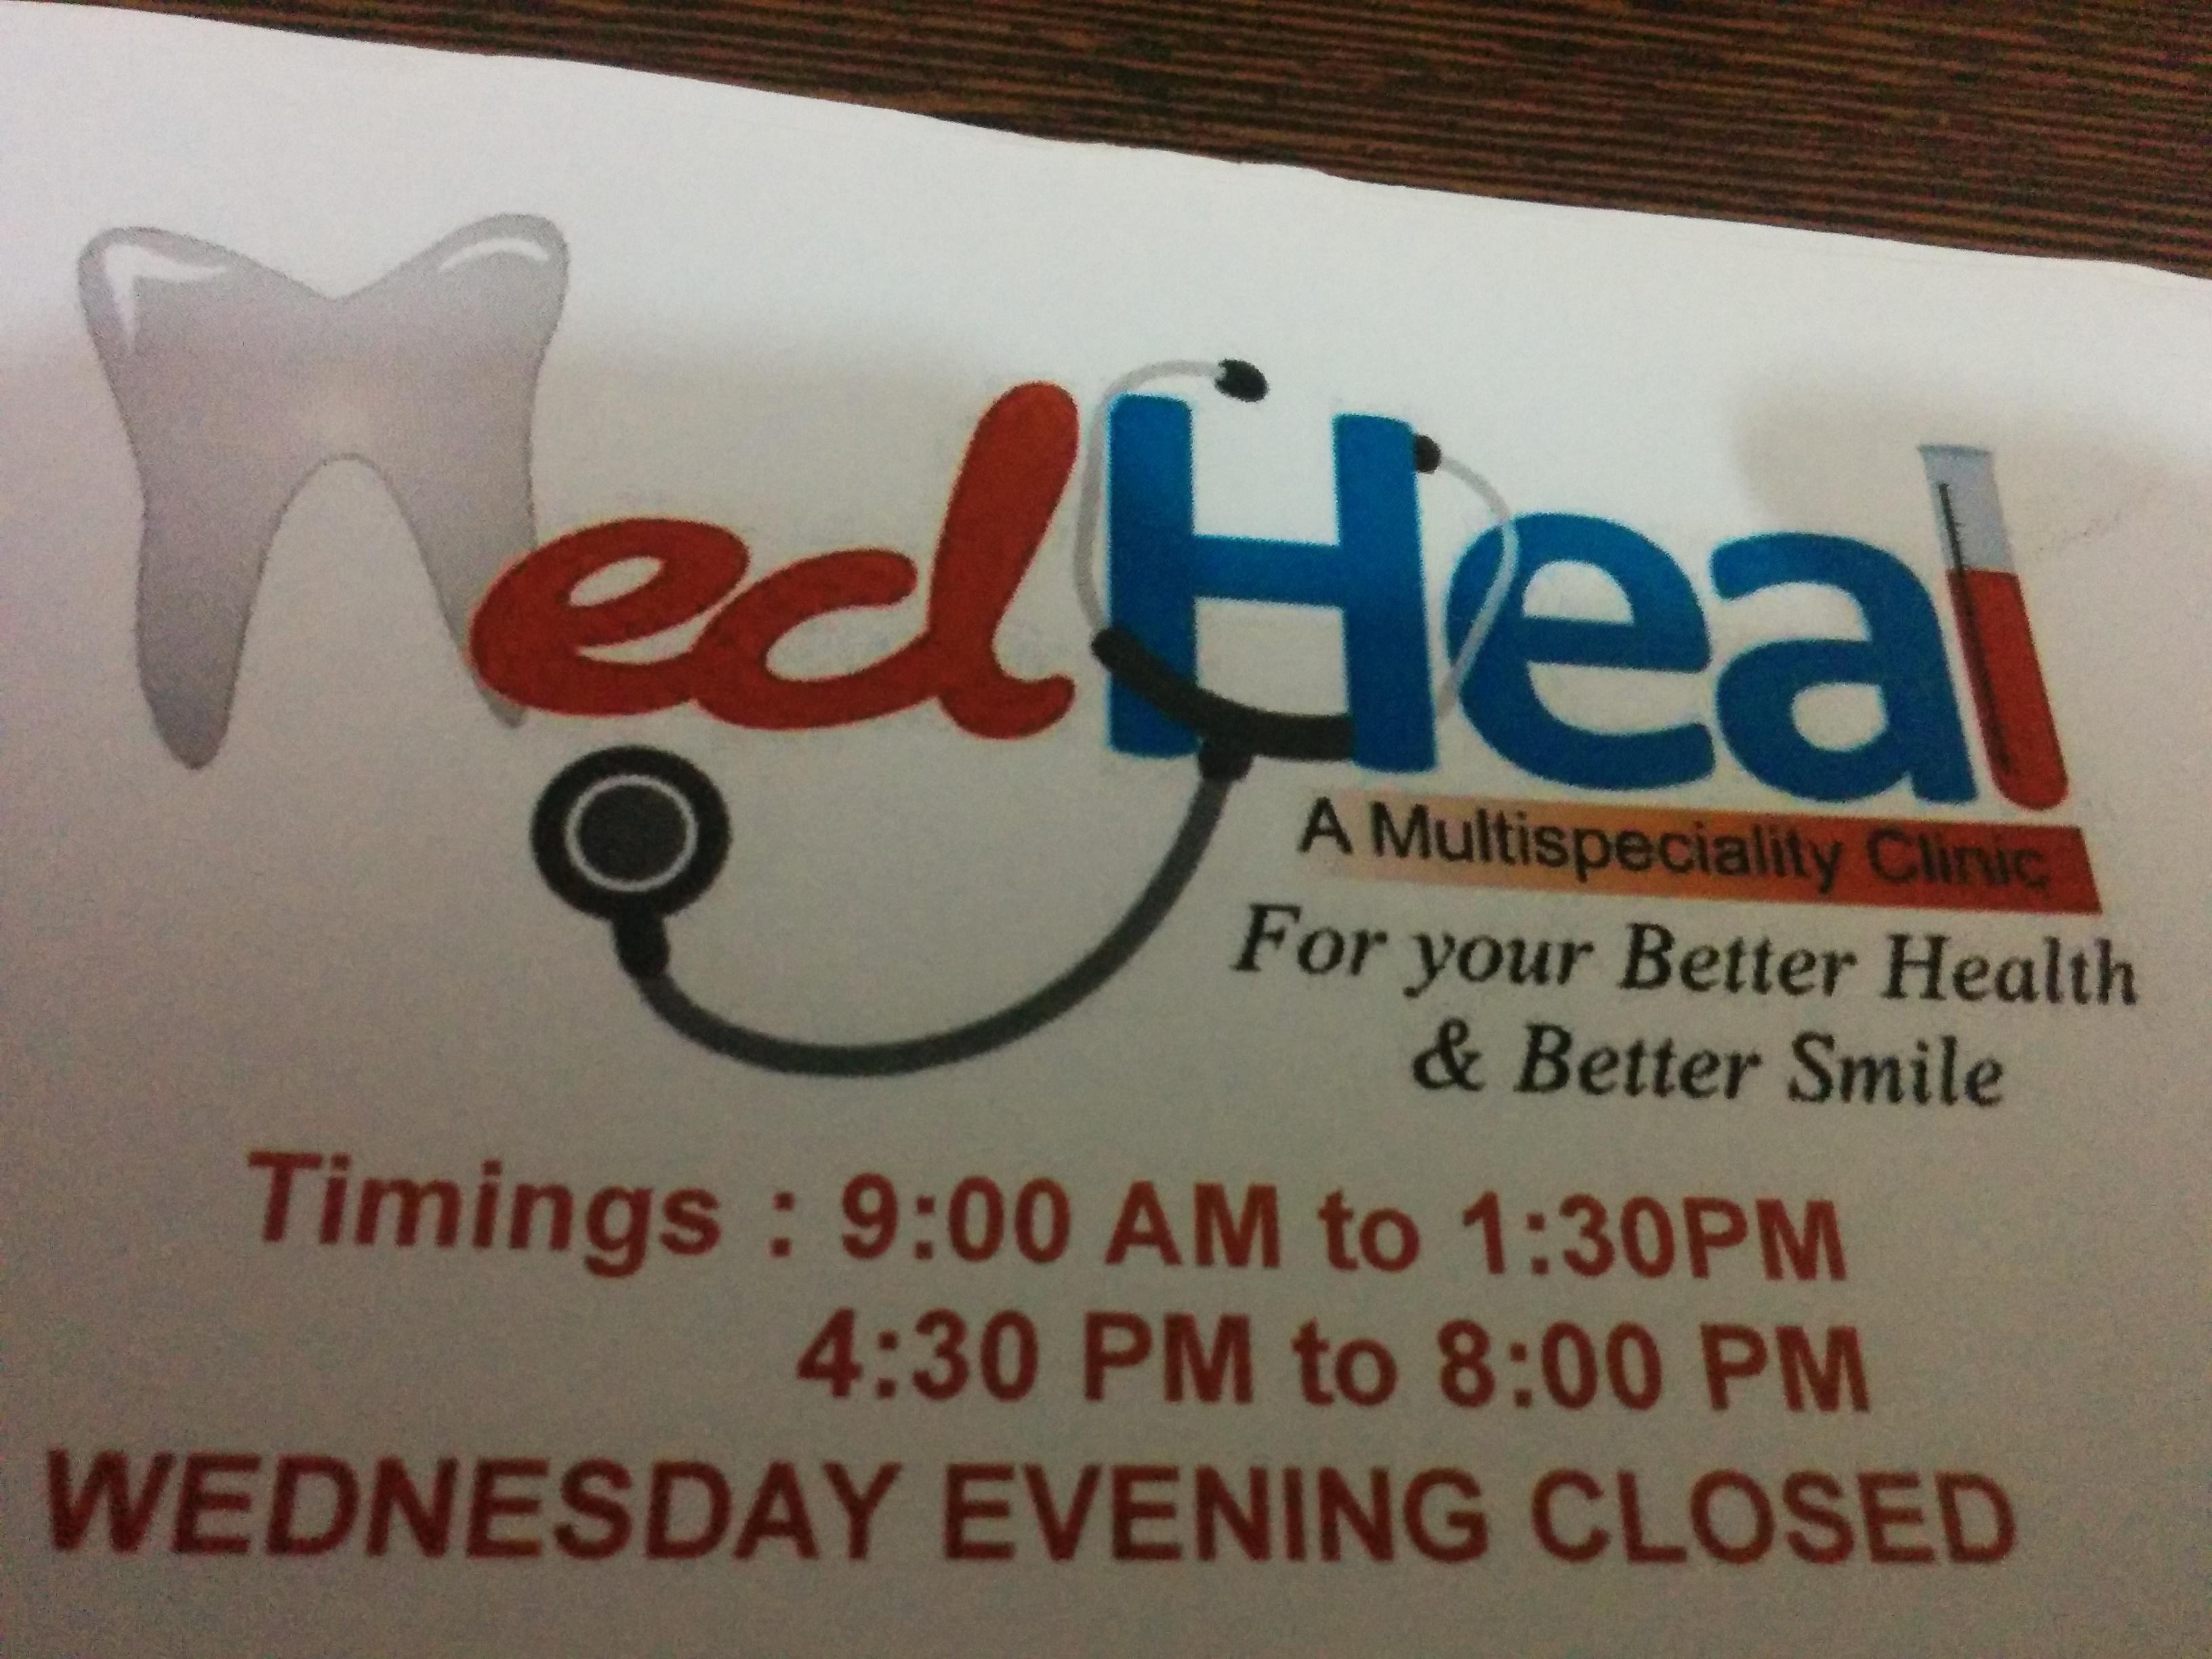 MedHeal A Multispeciality clinic